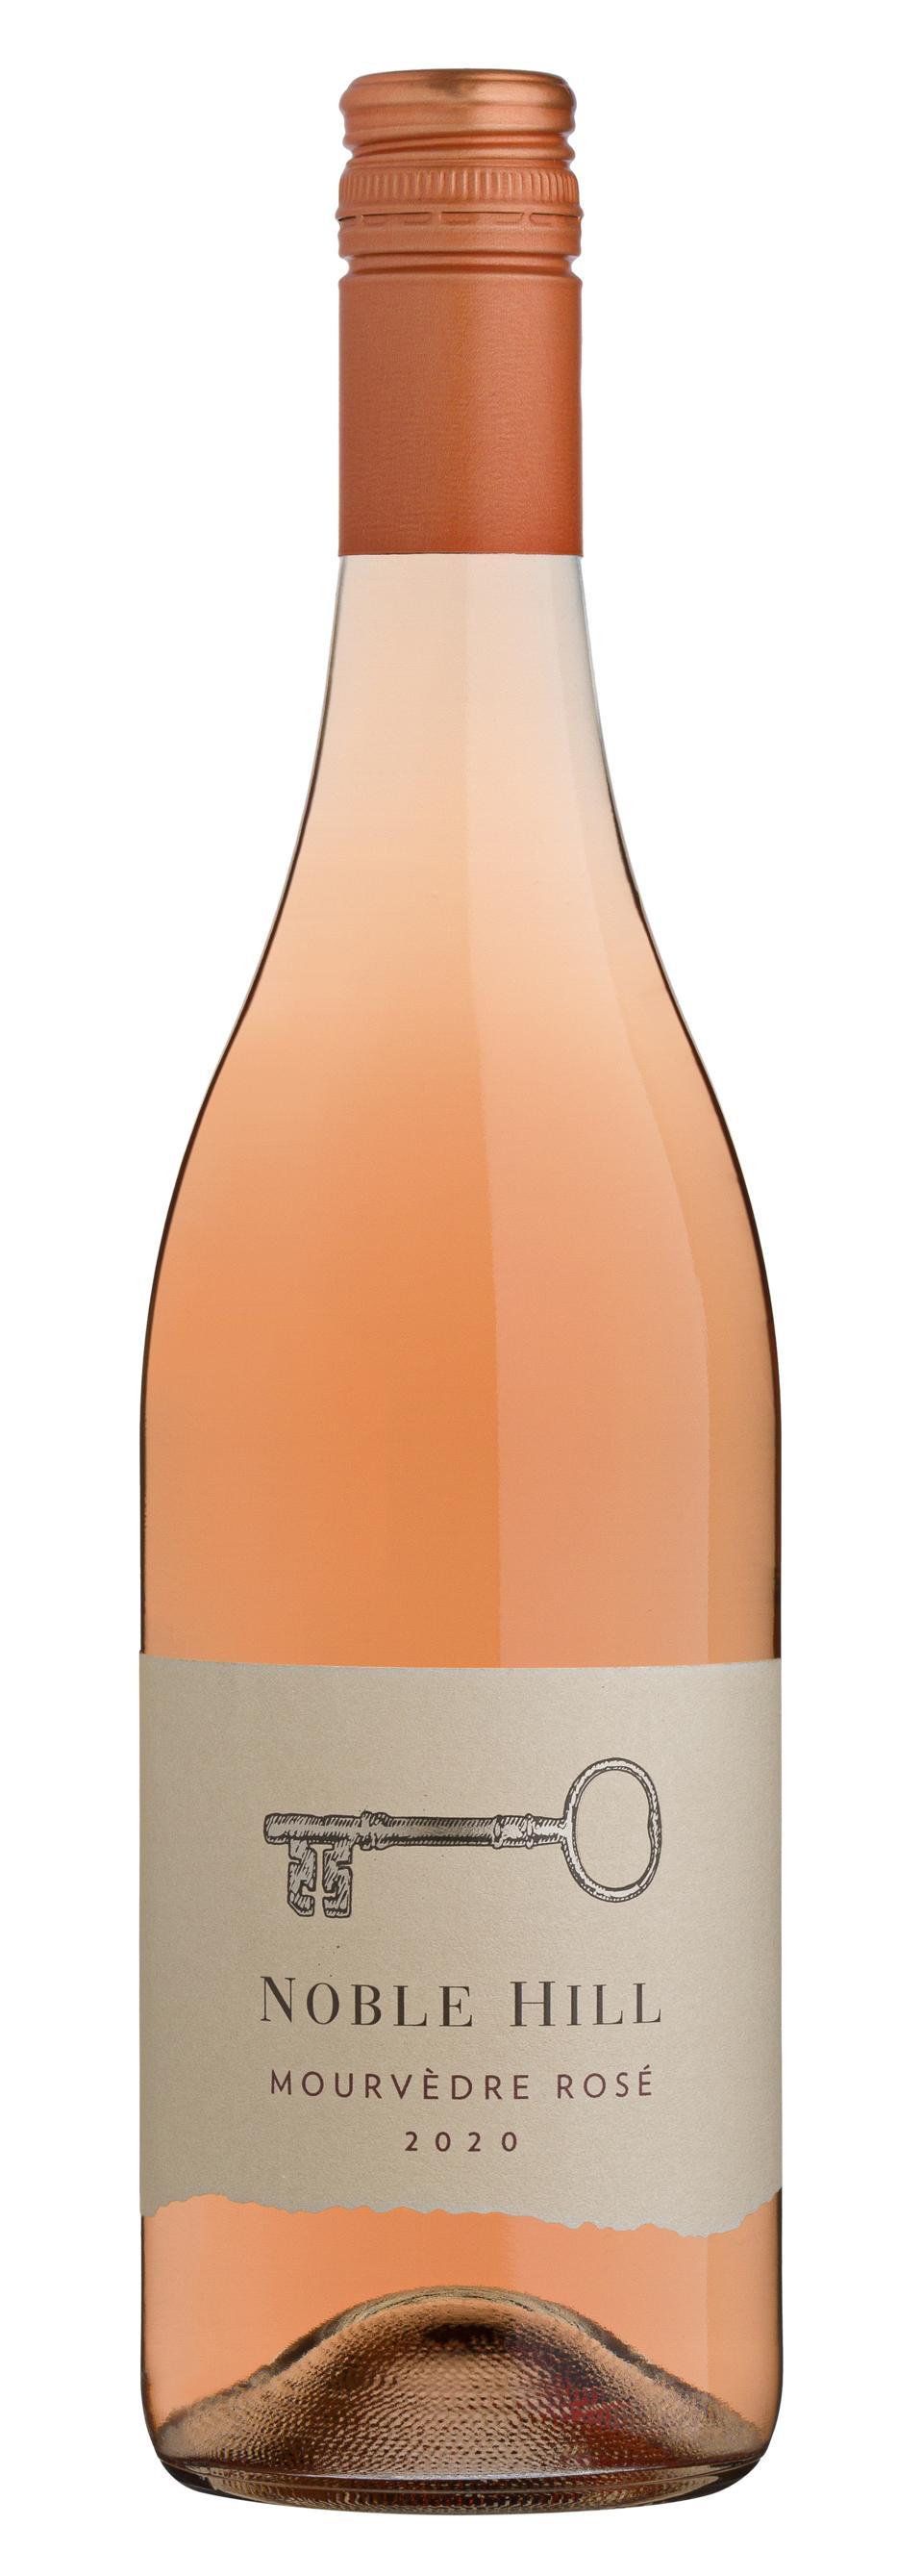 Bottle of Noble Hill Mourvedre Rosé 2020